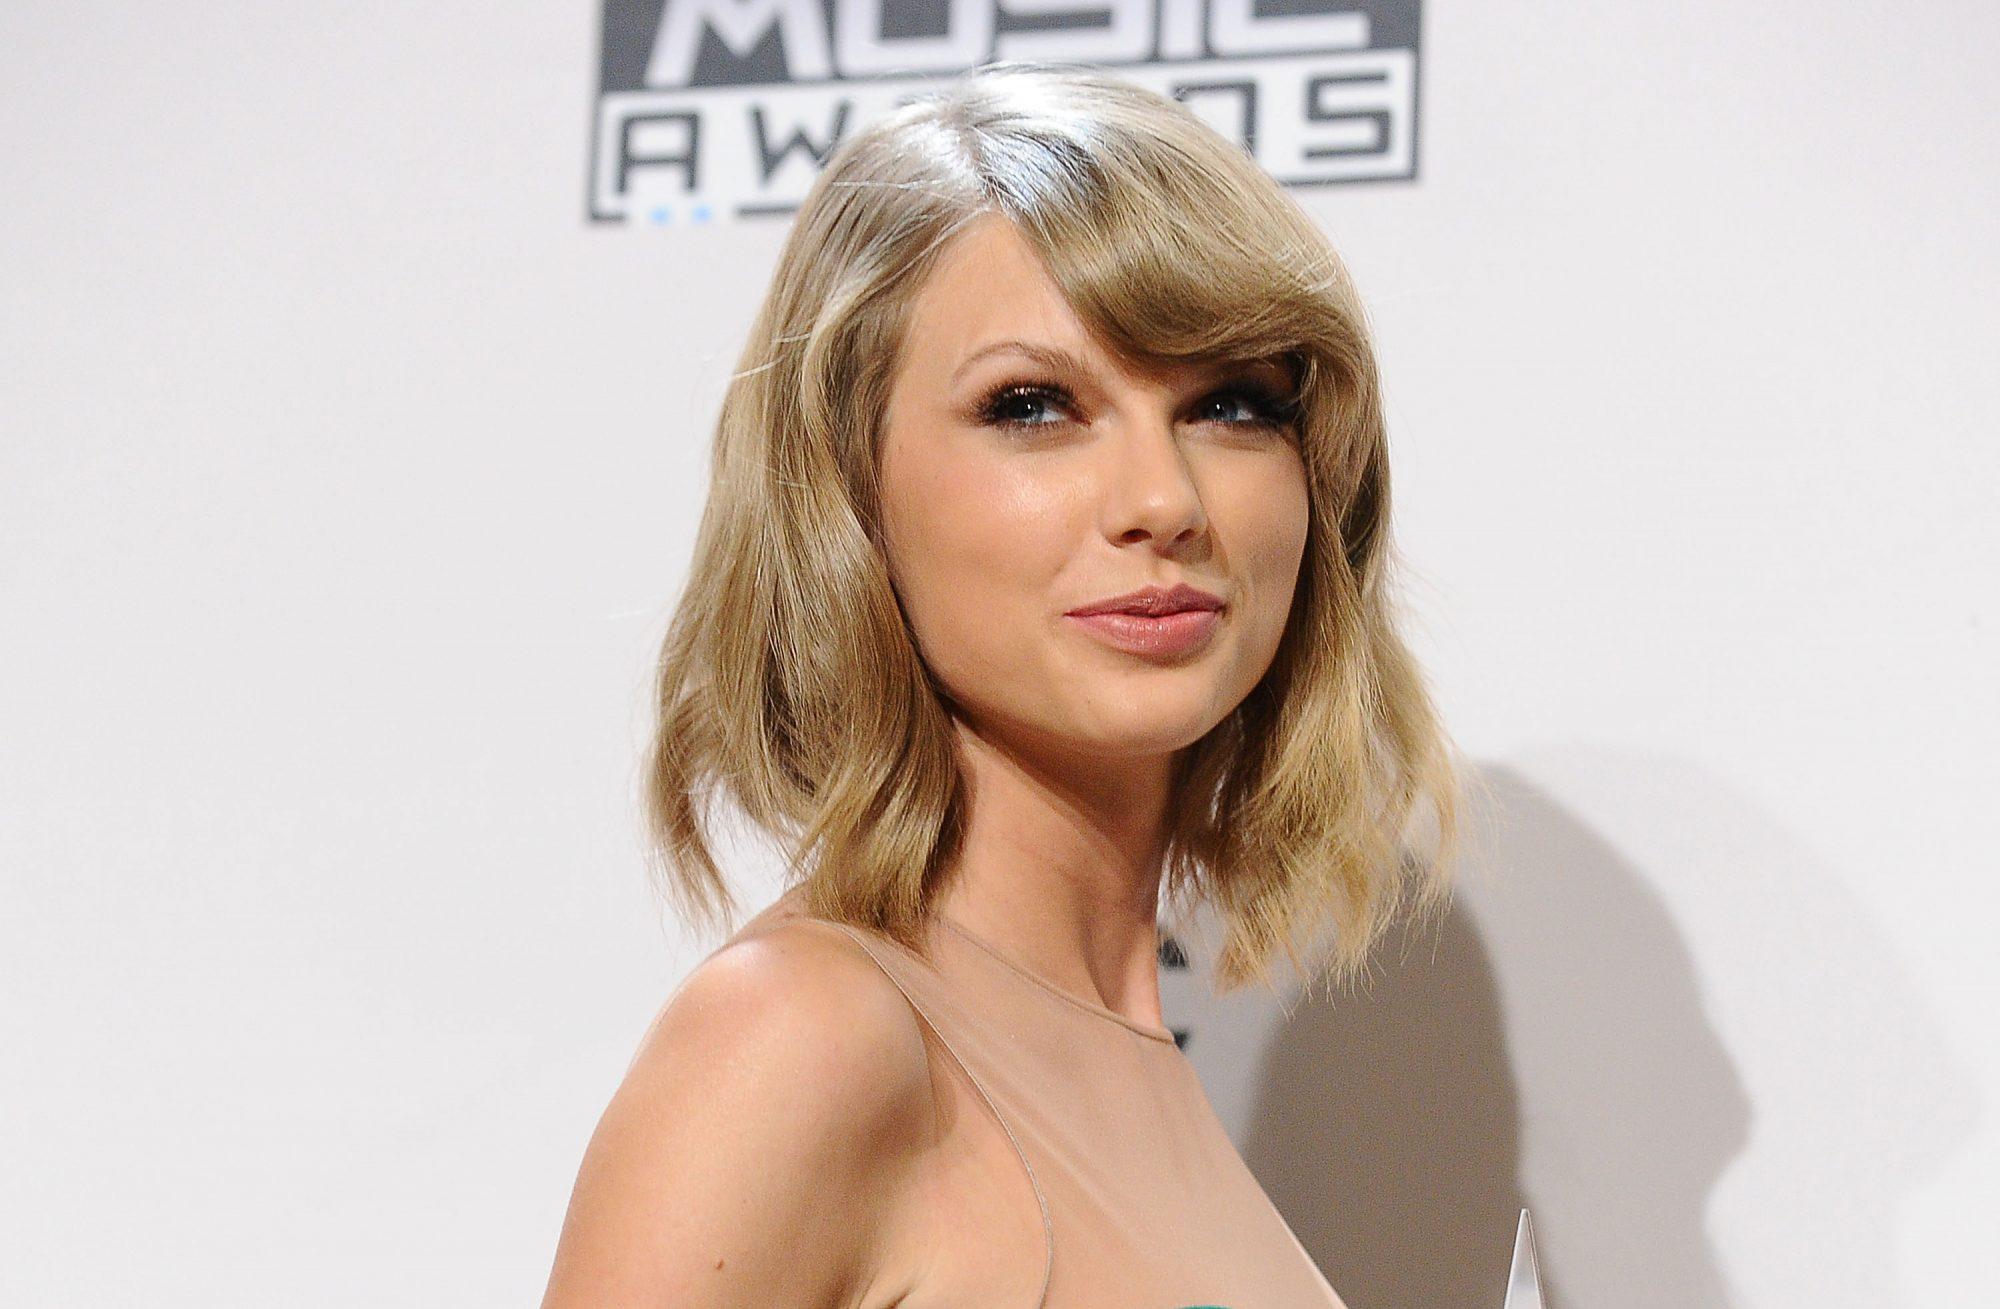 2014 American Music Awards - Press Room